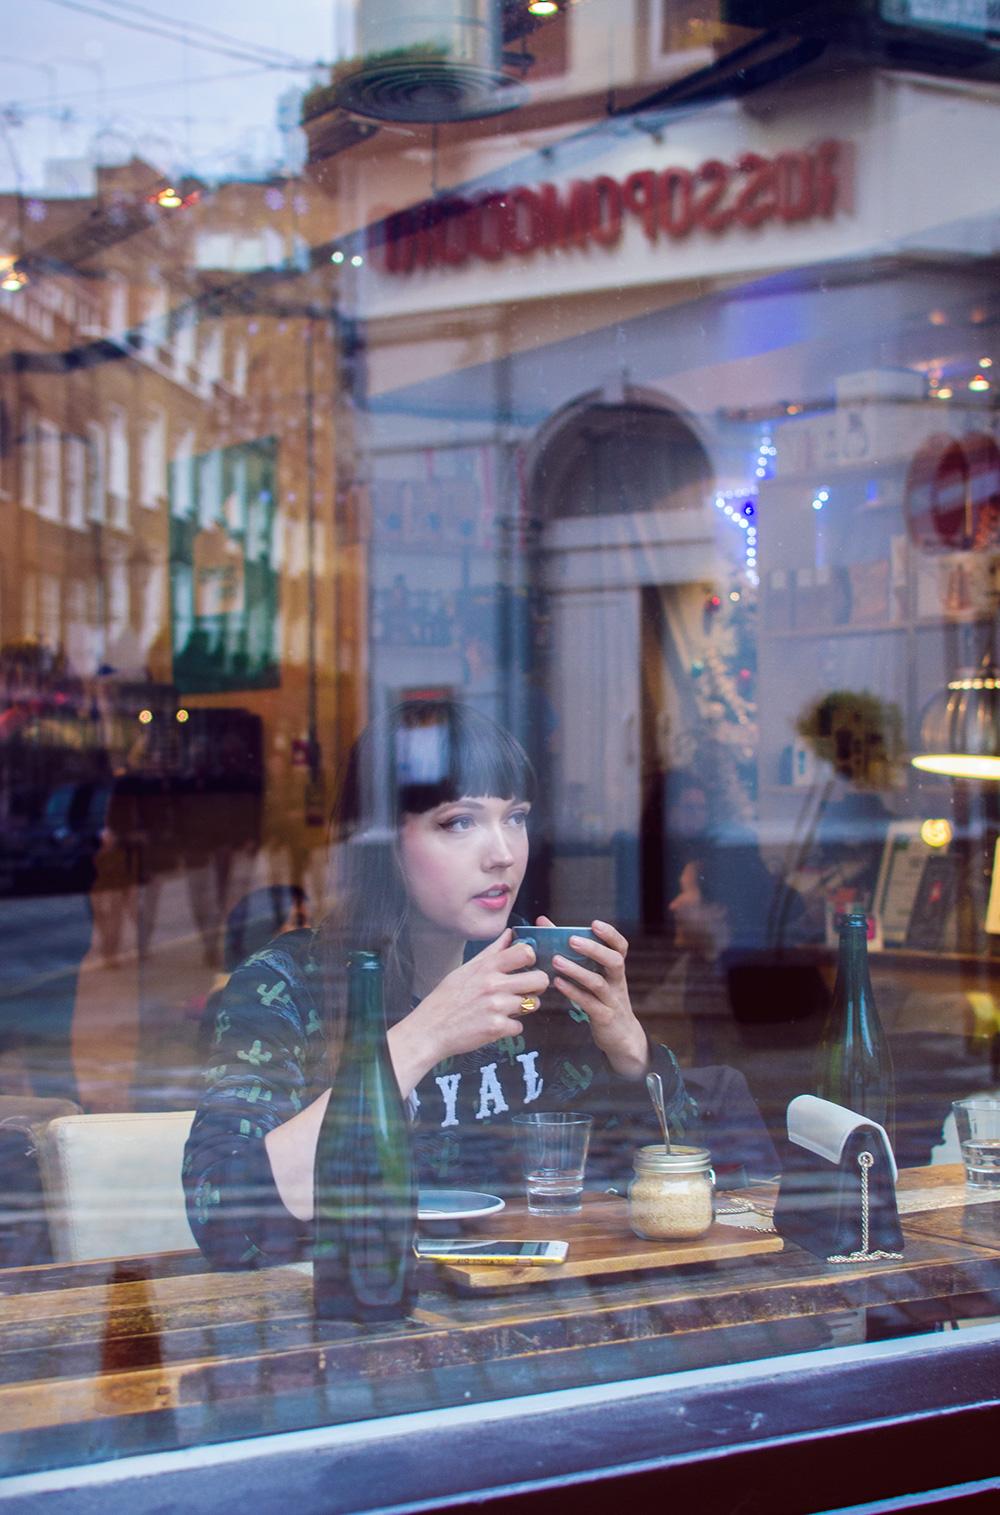 how-to-relax-at-a-city-break-zoe-karssen-royal-sweater-timberyard-london-6